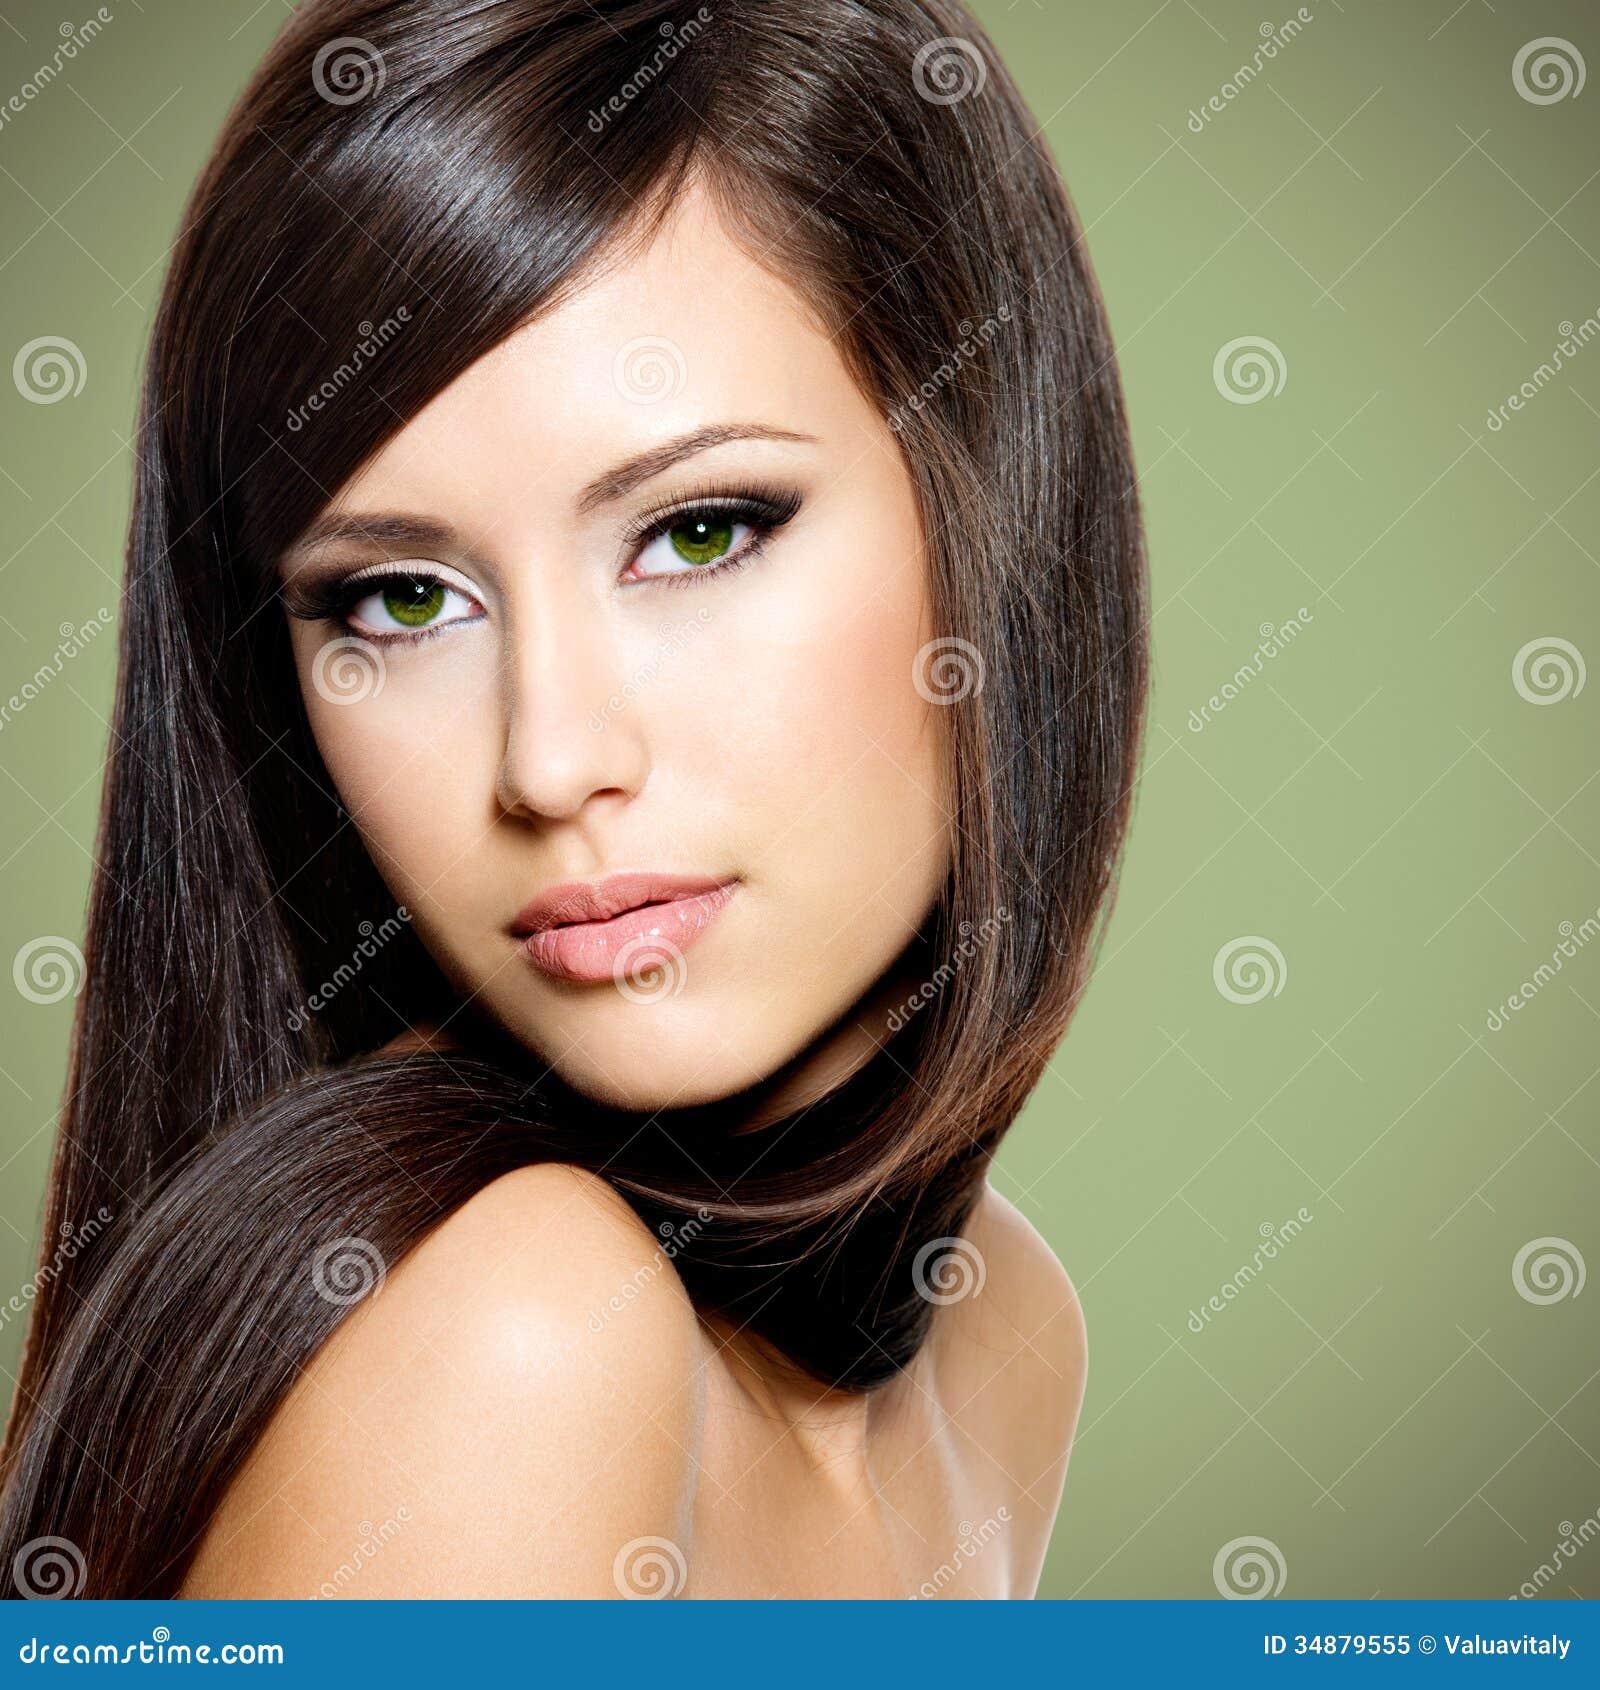 mulher-branca-bonita-com-cabelo-marrom-longo-34879555.jpg